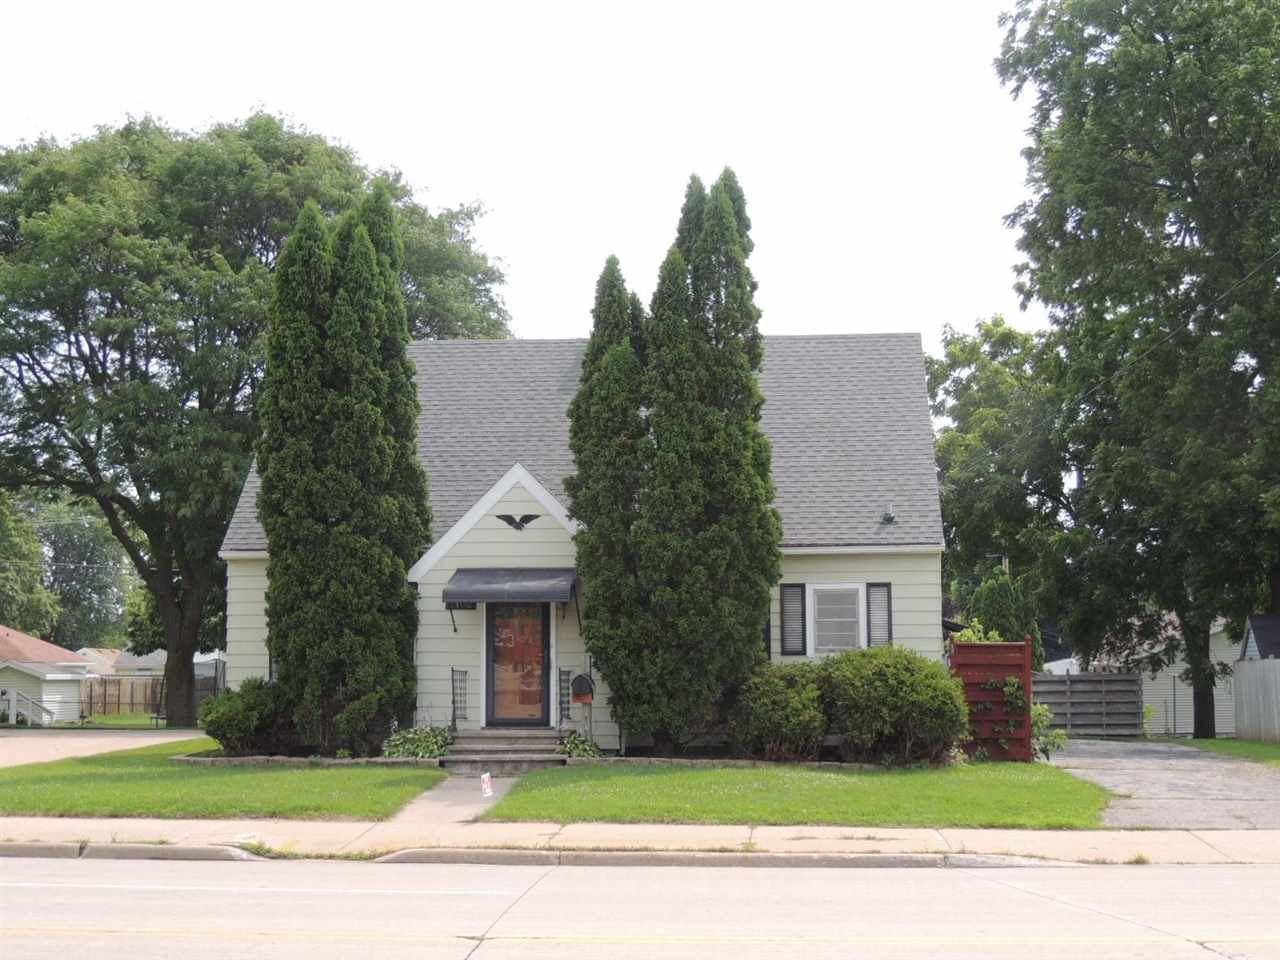 2102 N RICHMOND Street, Appleton, WI 54911 - MLS#: 50244138